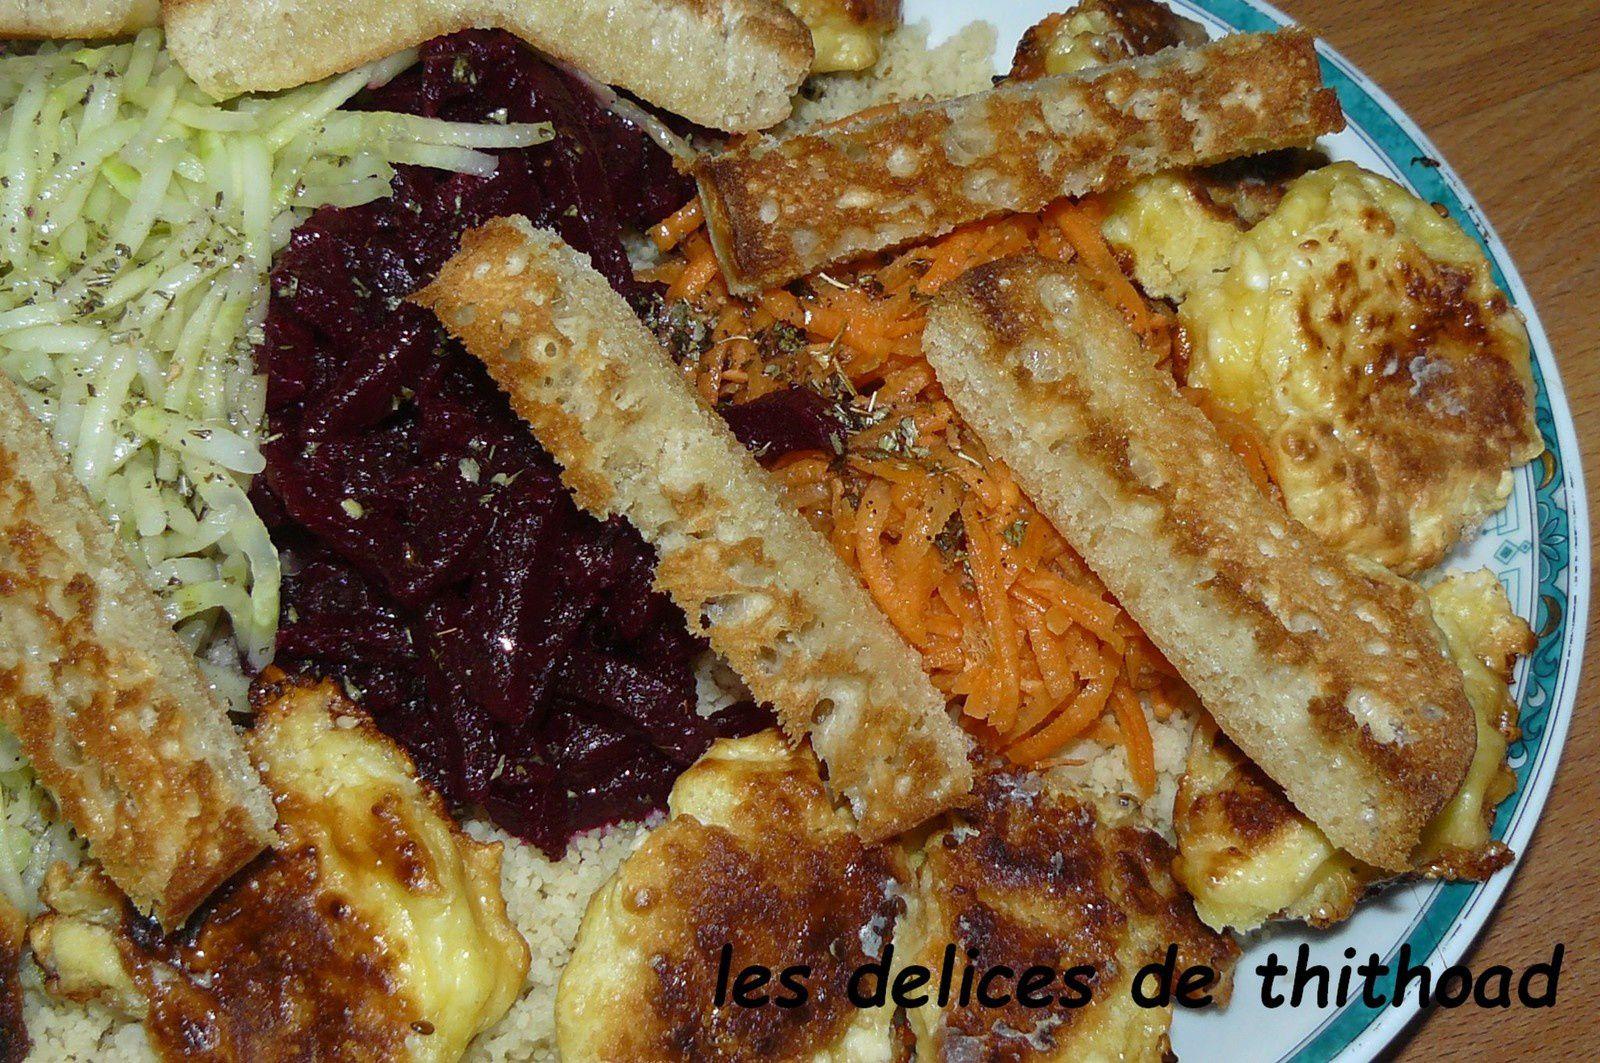 salade arc-en-ciel de légumes râpés et croquettes de feta